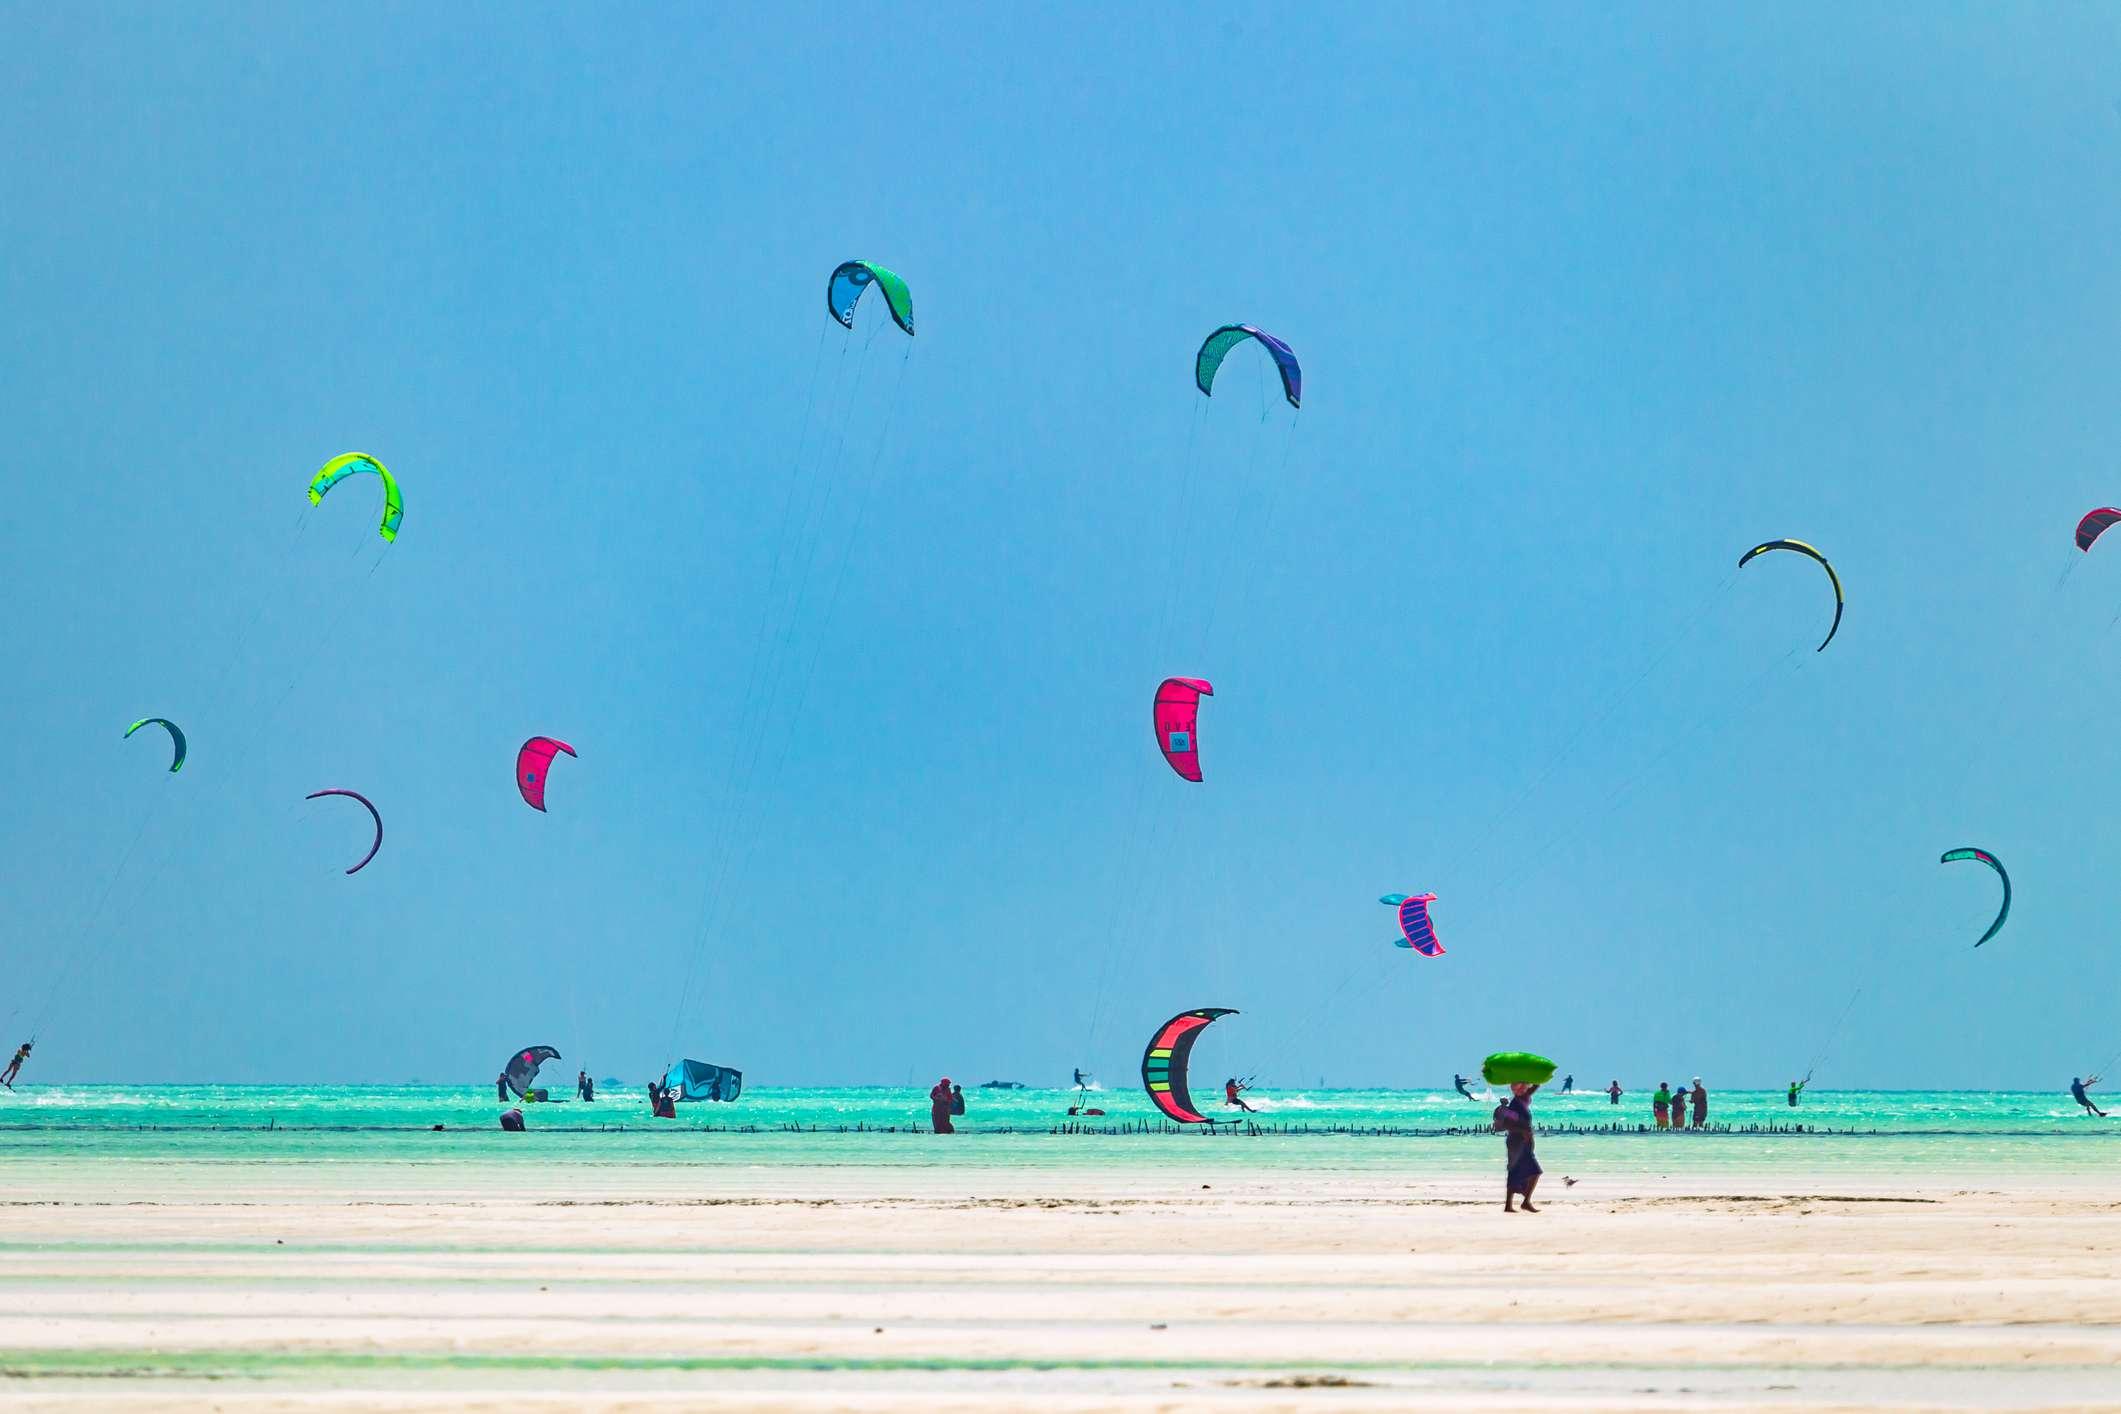 Kitesurfers at Paje Beach, Zanzibar